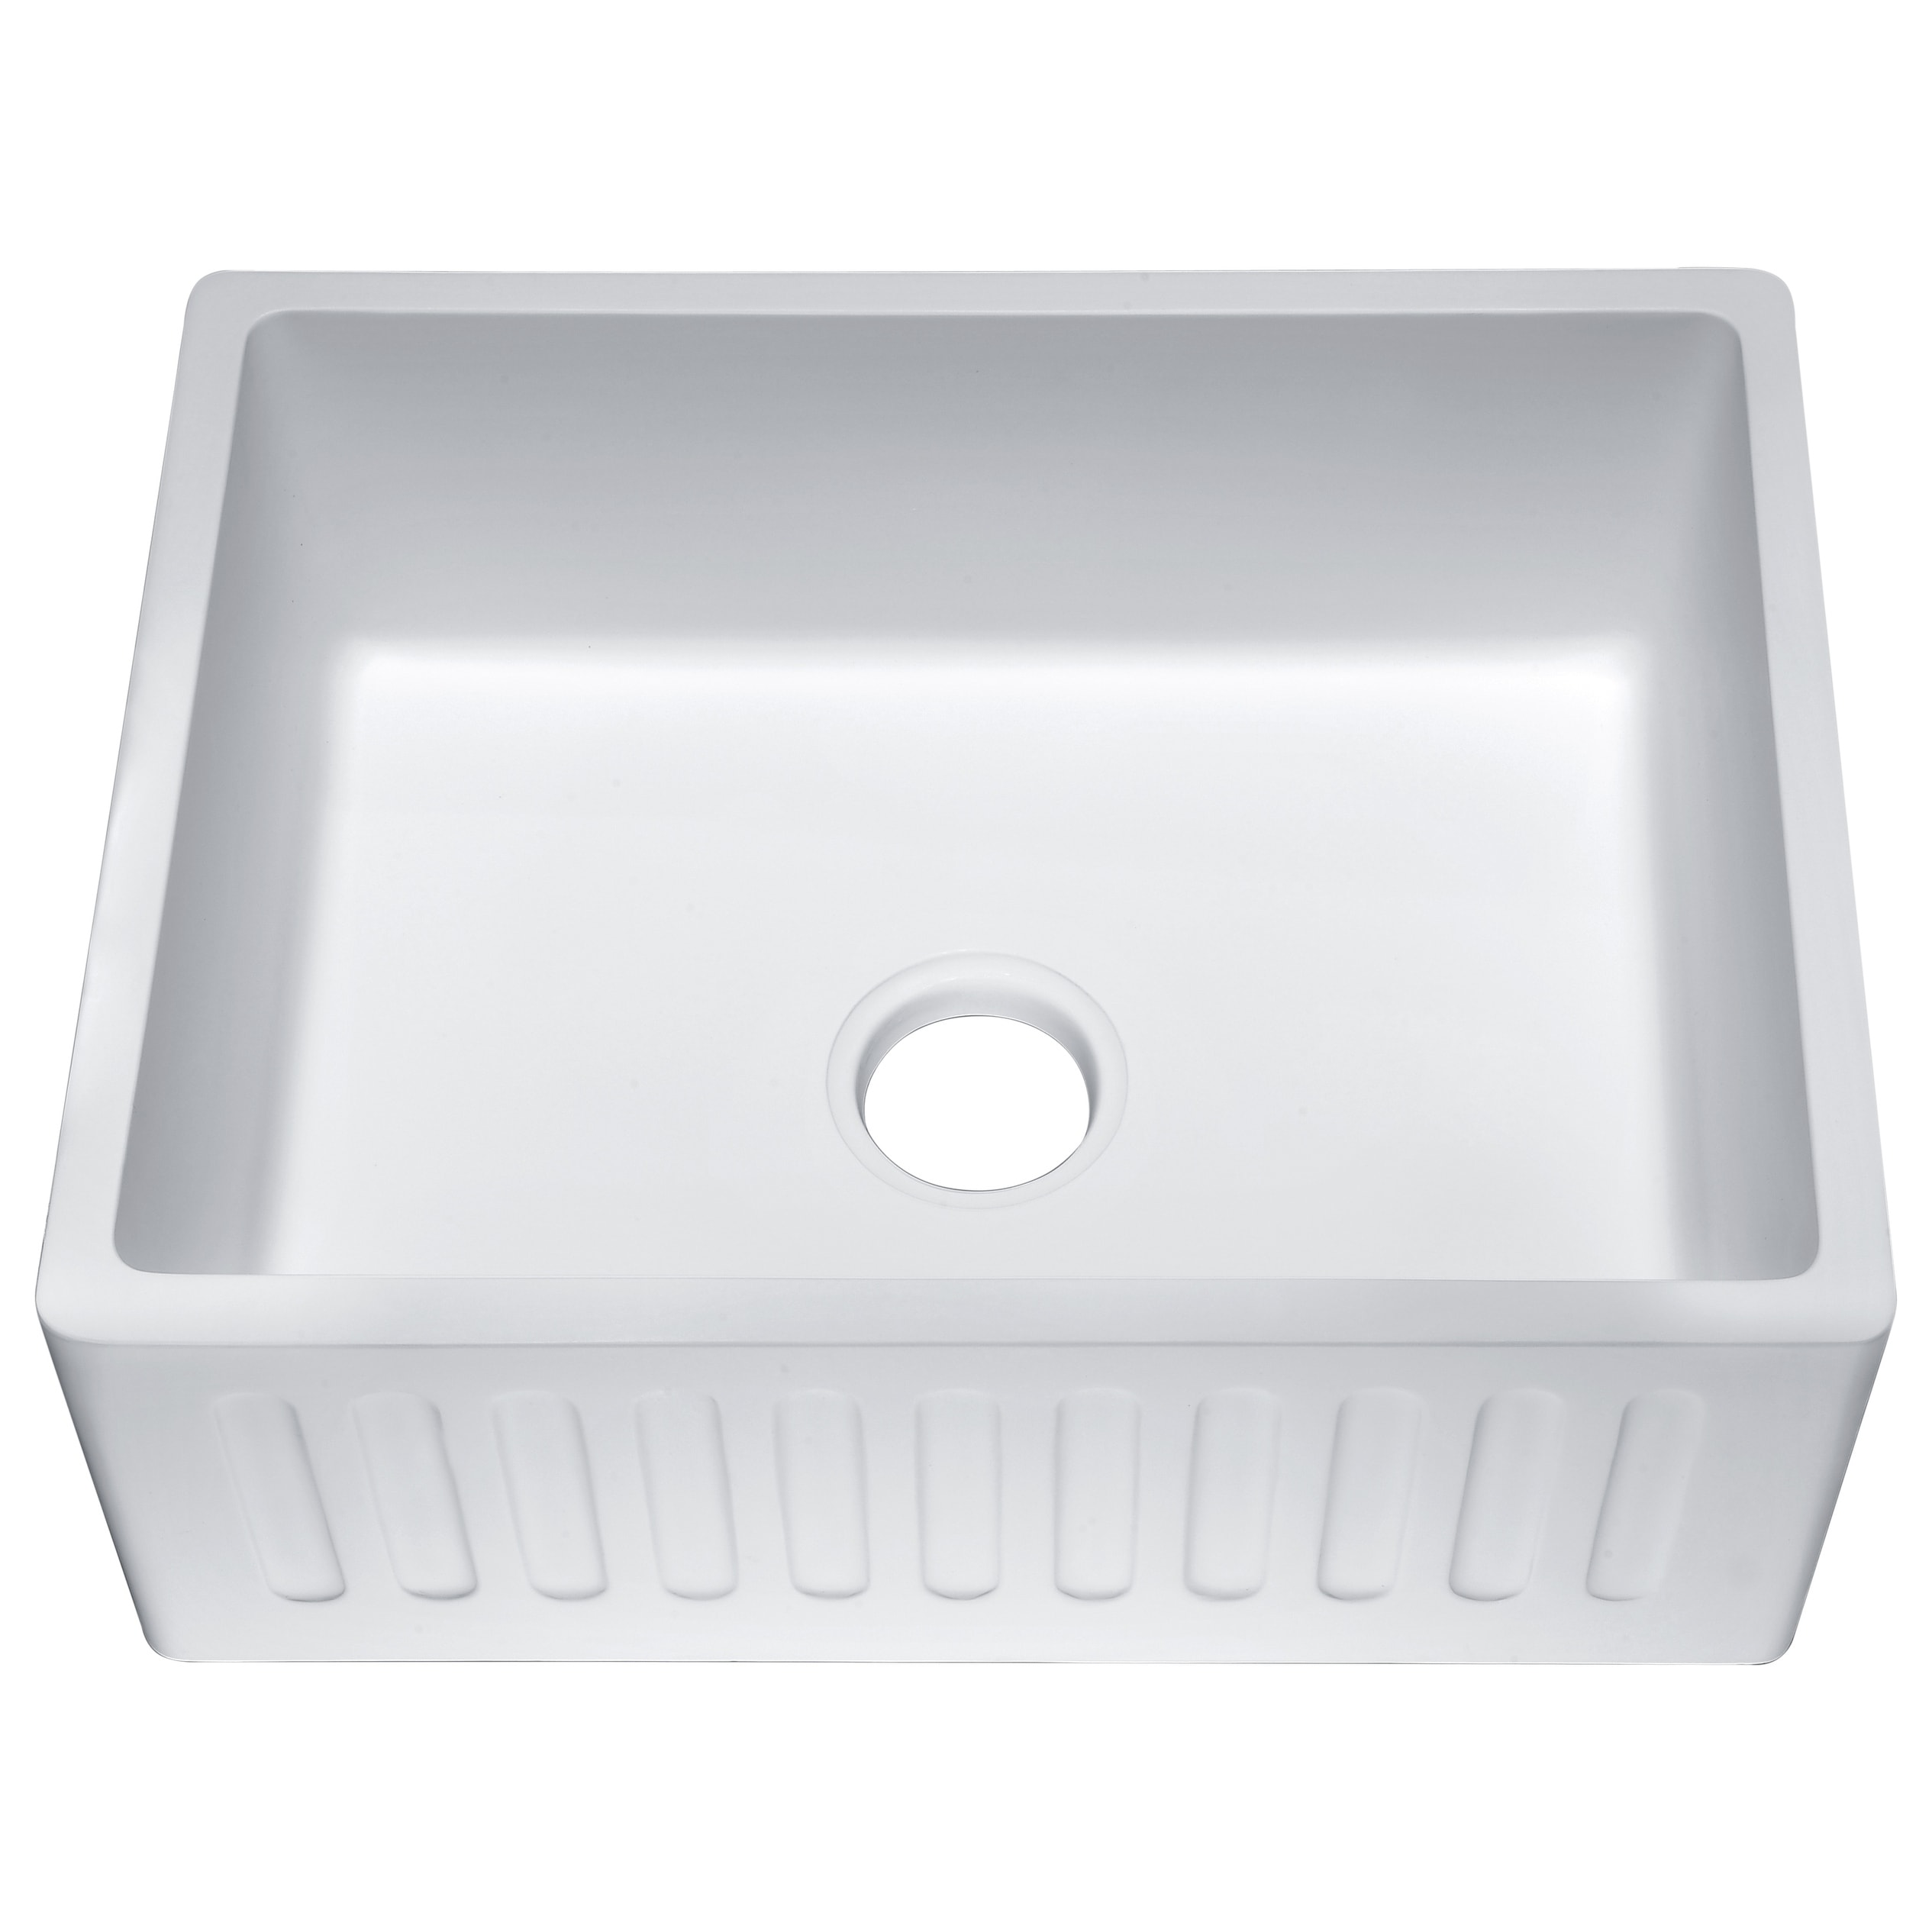 Roine 24 In. Farmhouse Apron Front Man Made Stone Single Bowl Kitchen Sink  in Matte White